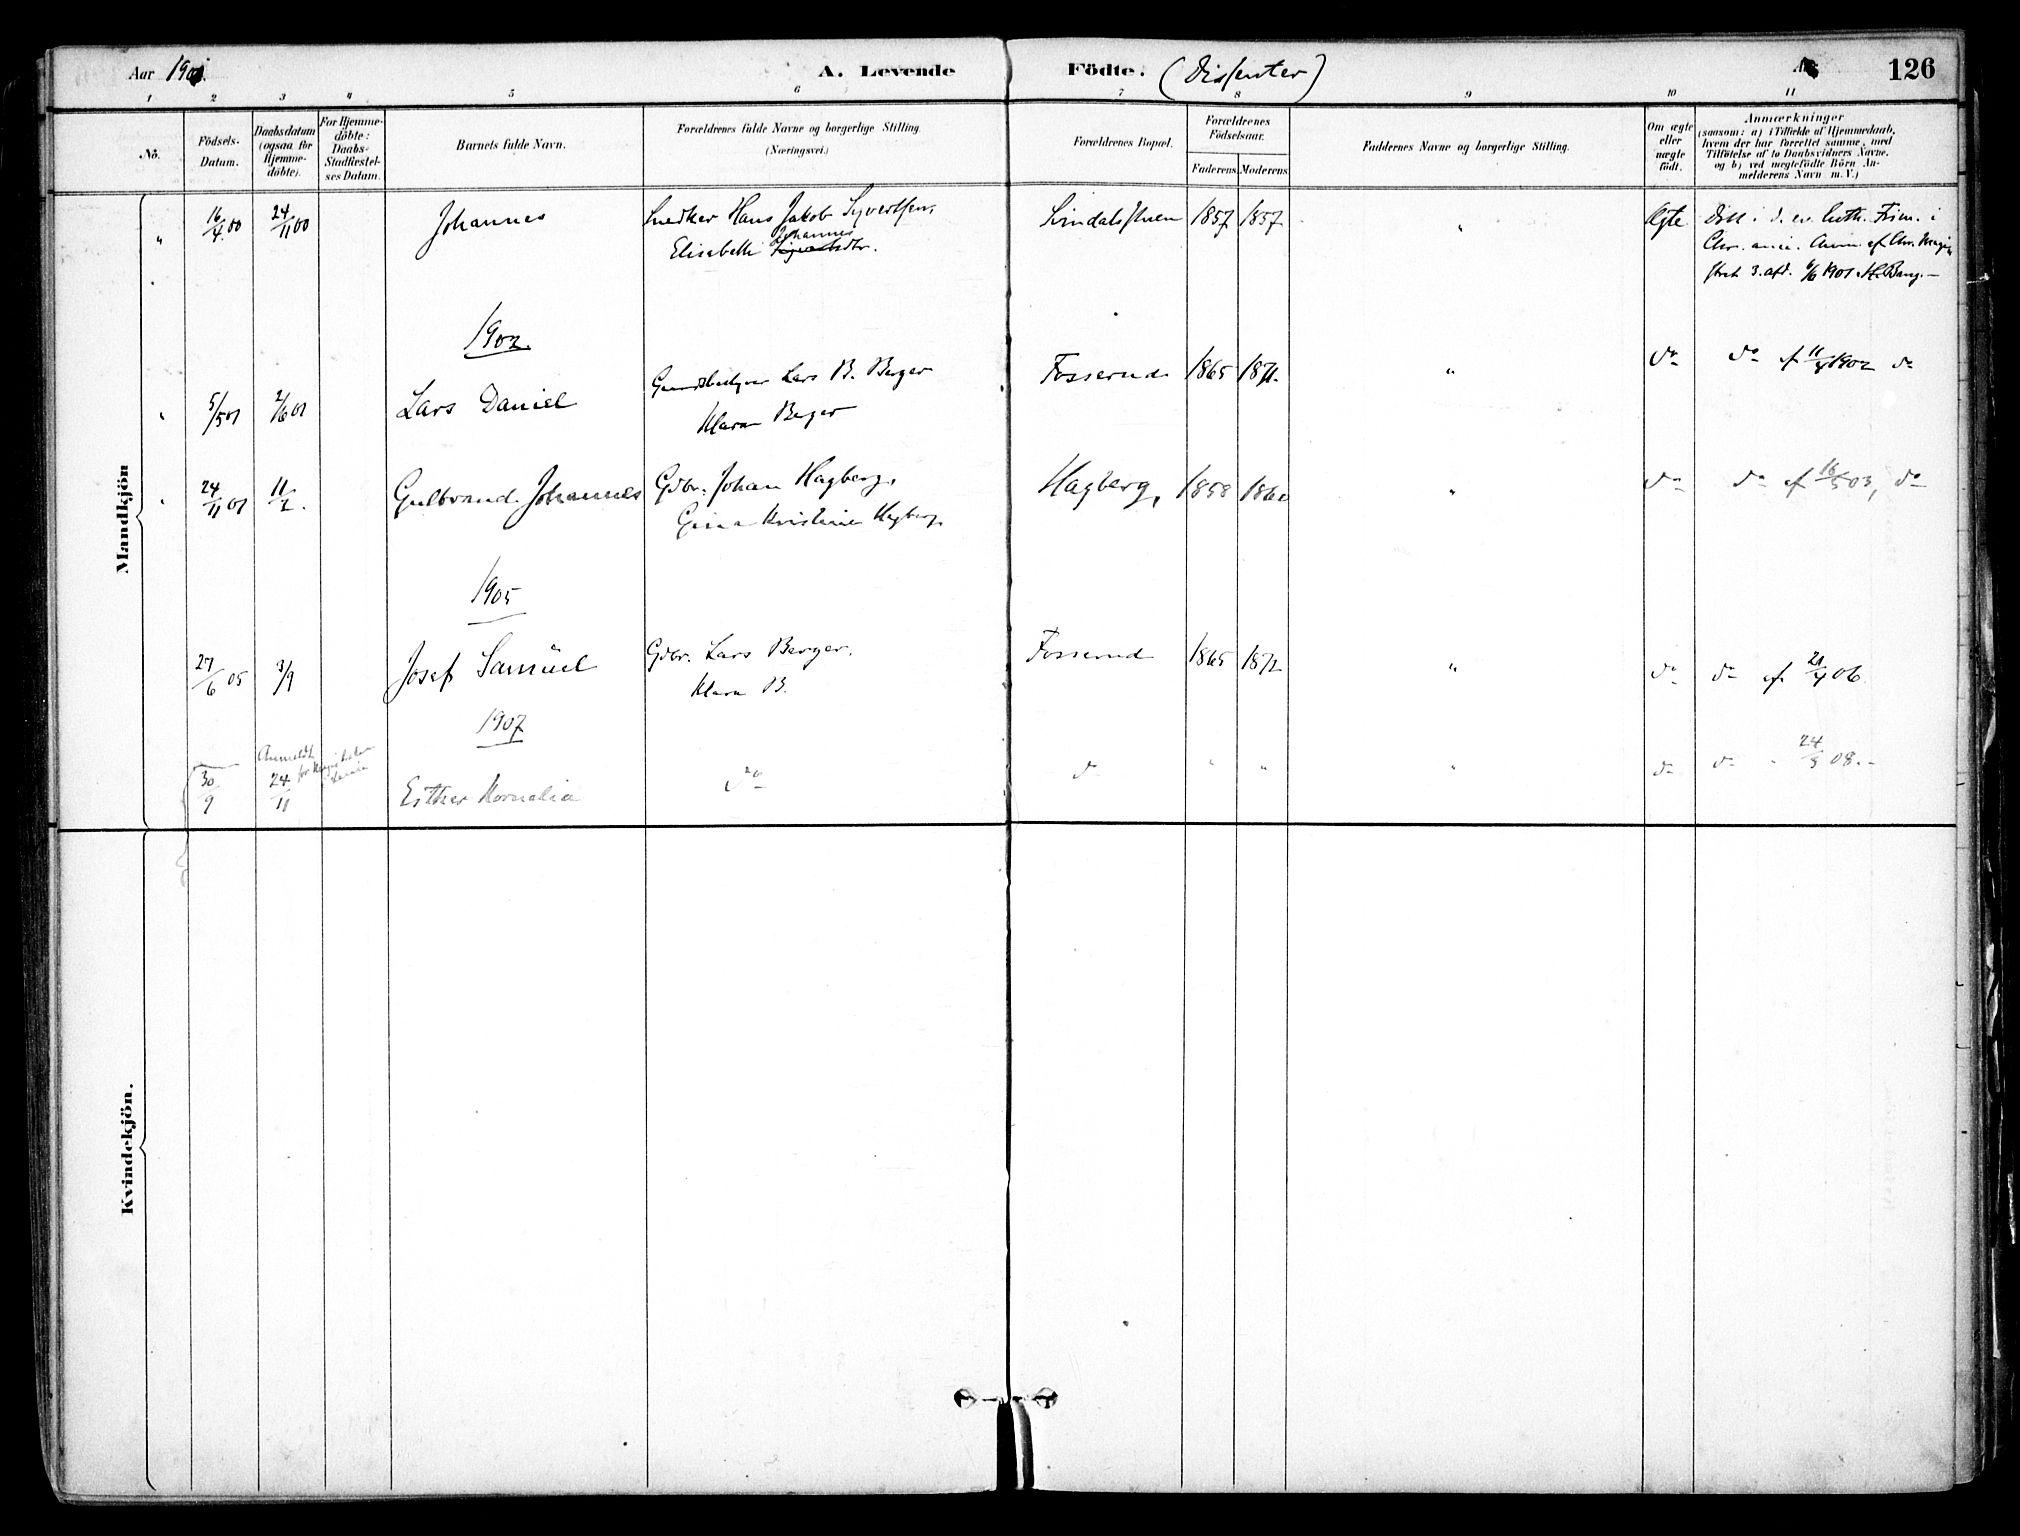 SAO, Nes prestekontor Kirkebøker, F/Fb/L0002: Ministerialbok nr. II 2, 1883-1918, s. 126